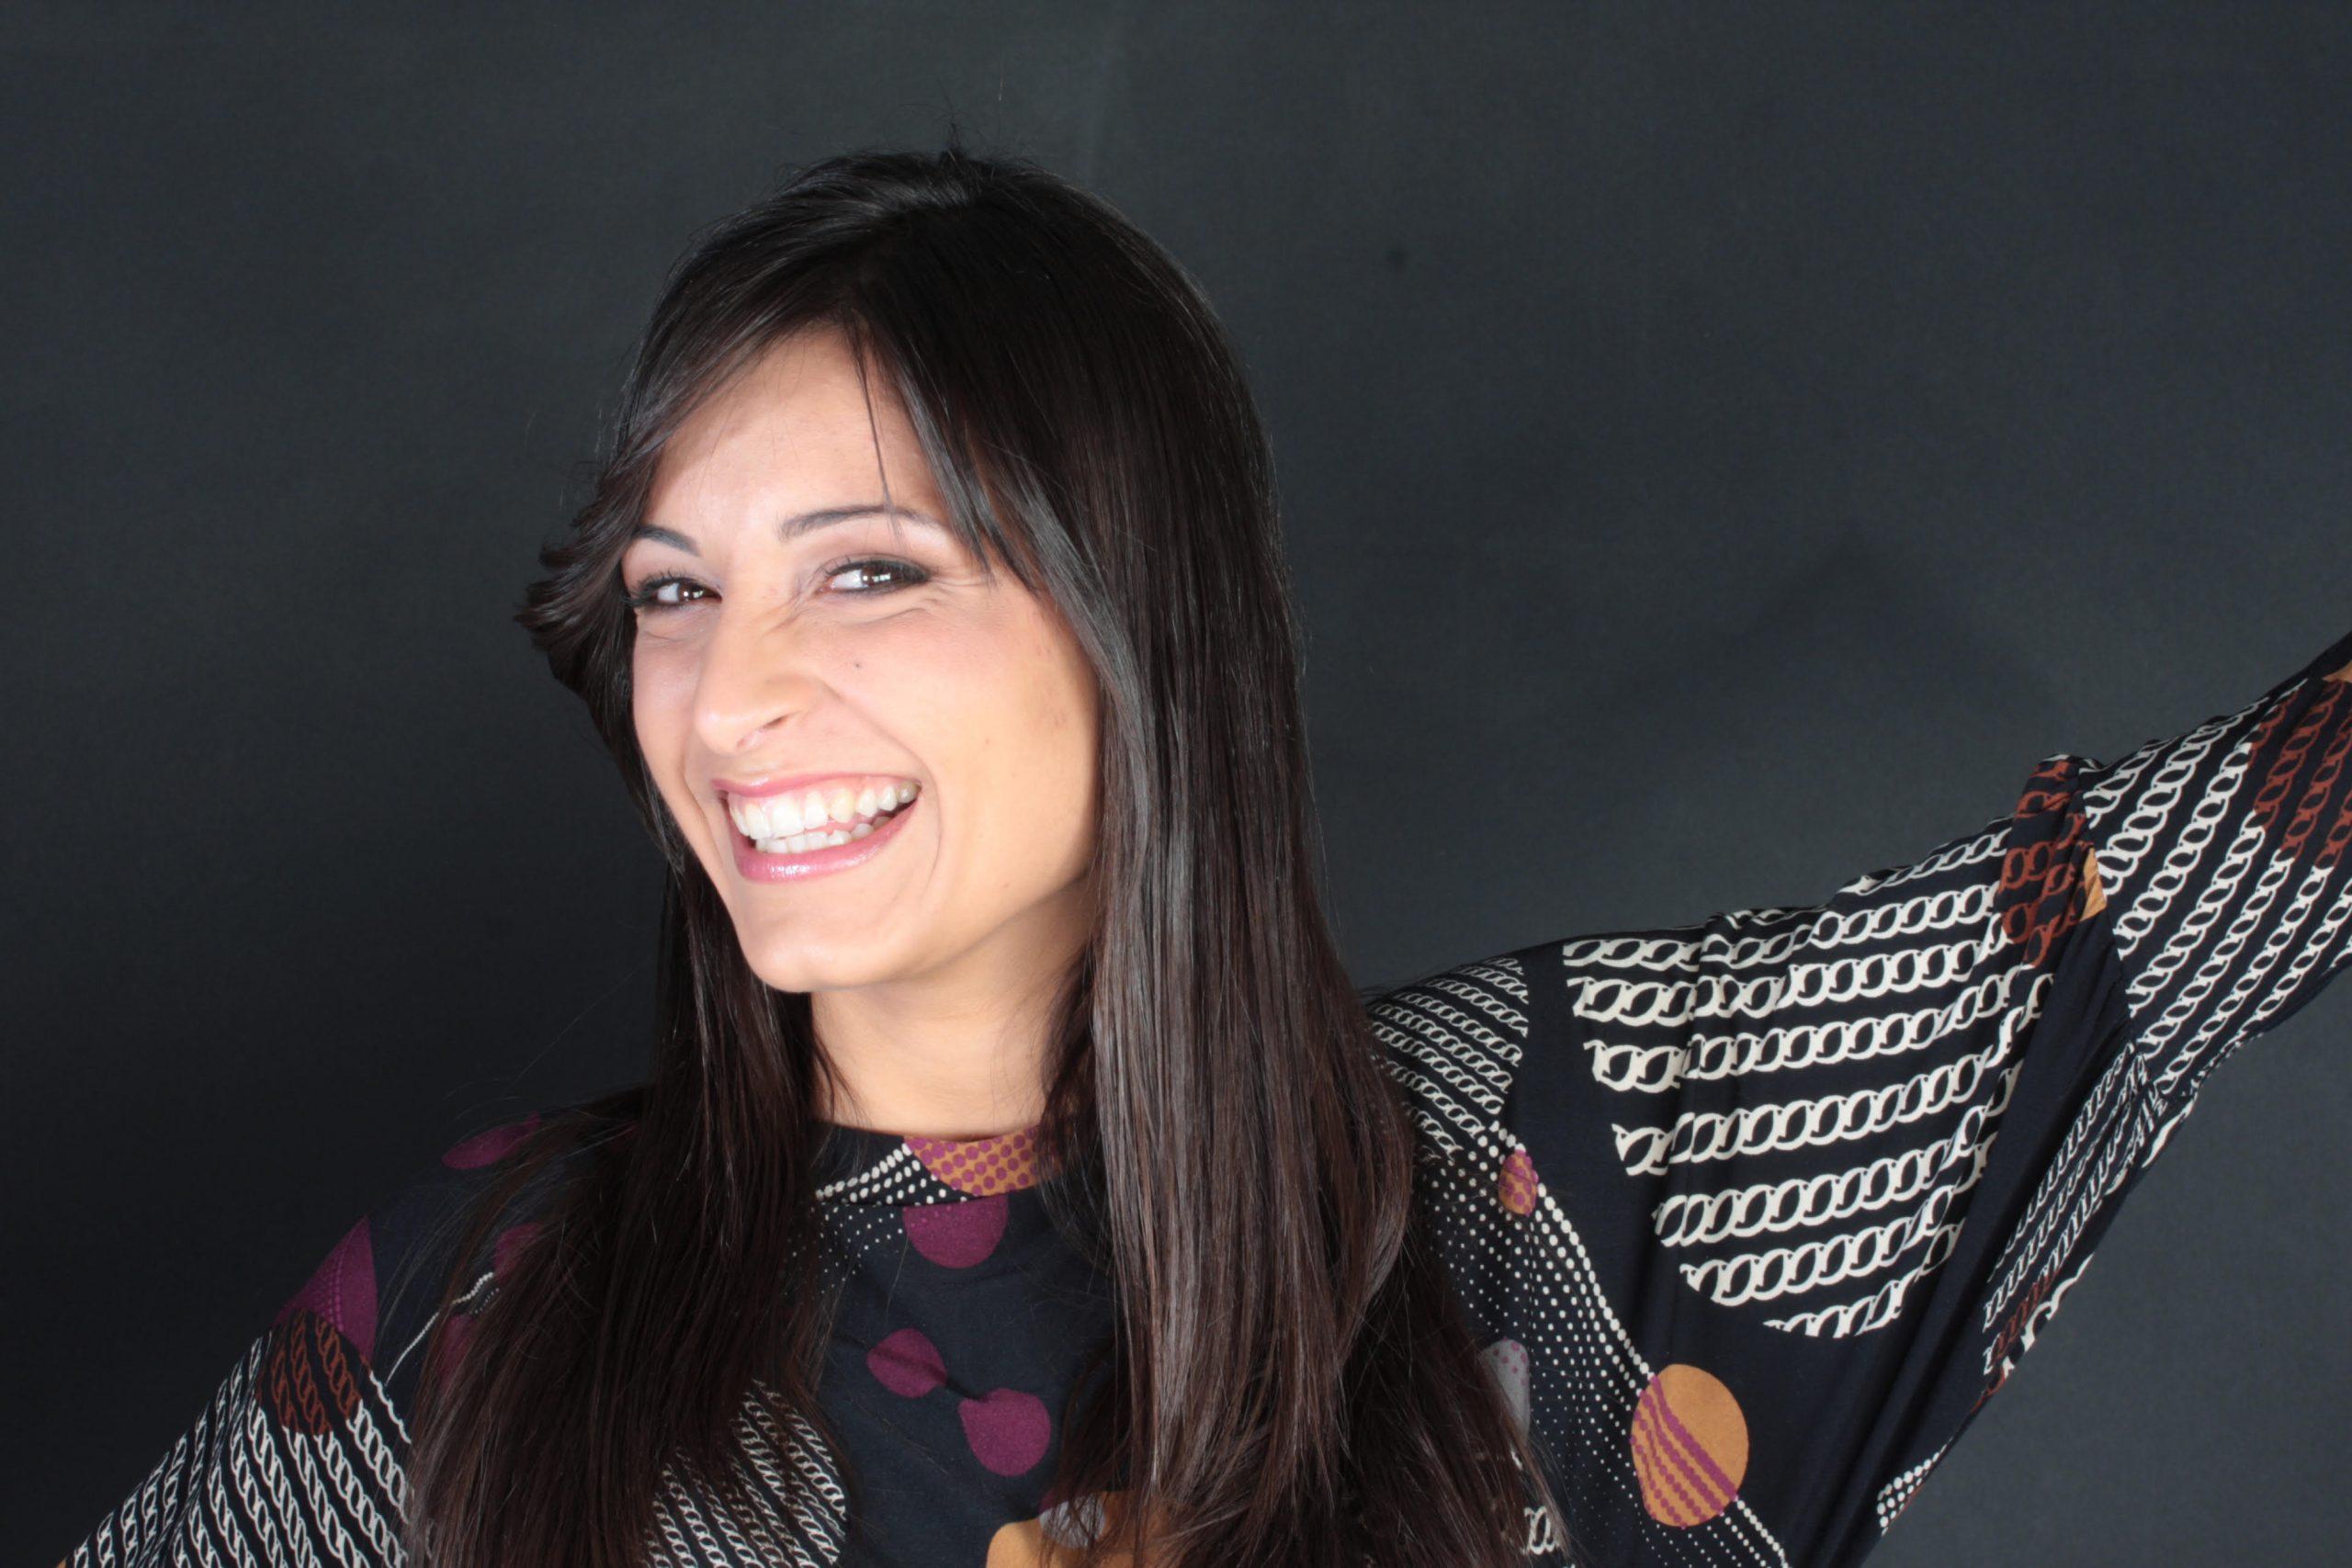 Elena a braccia aperte che sorride